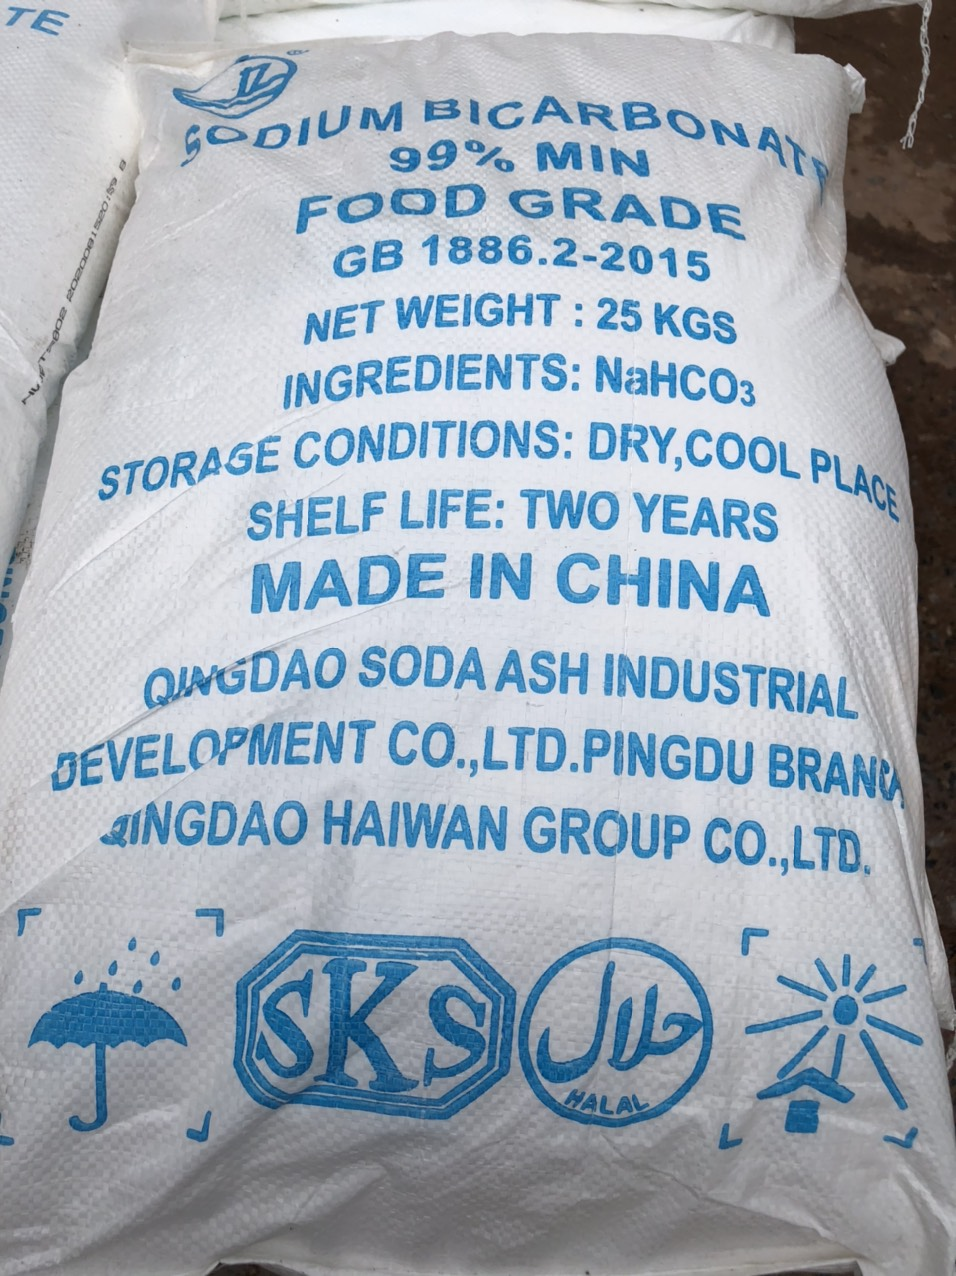 Sodium Bicarbonate 99% - Food Grate